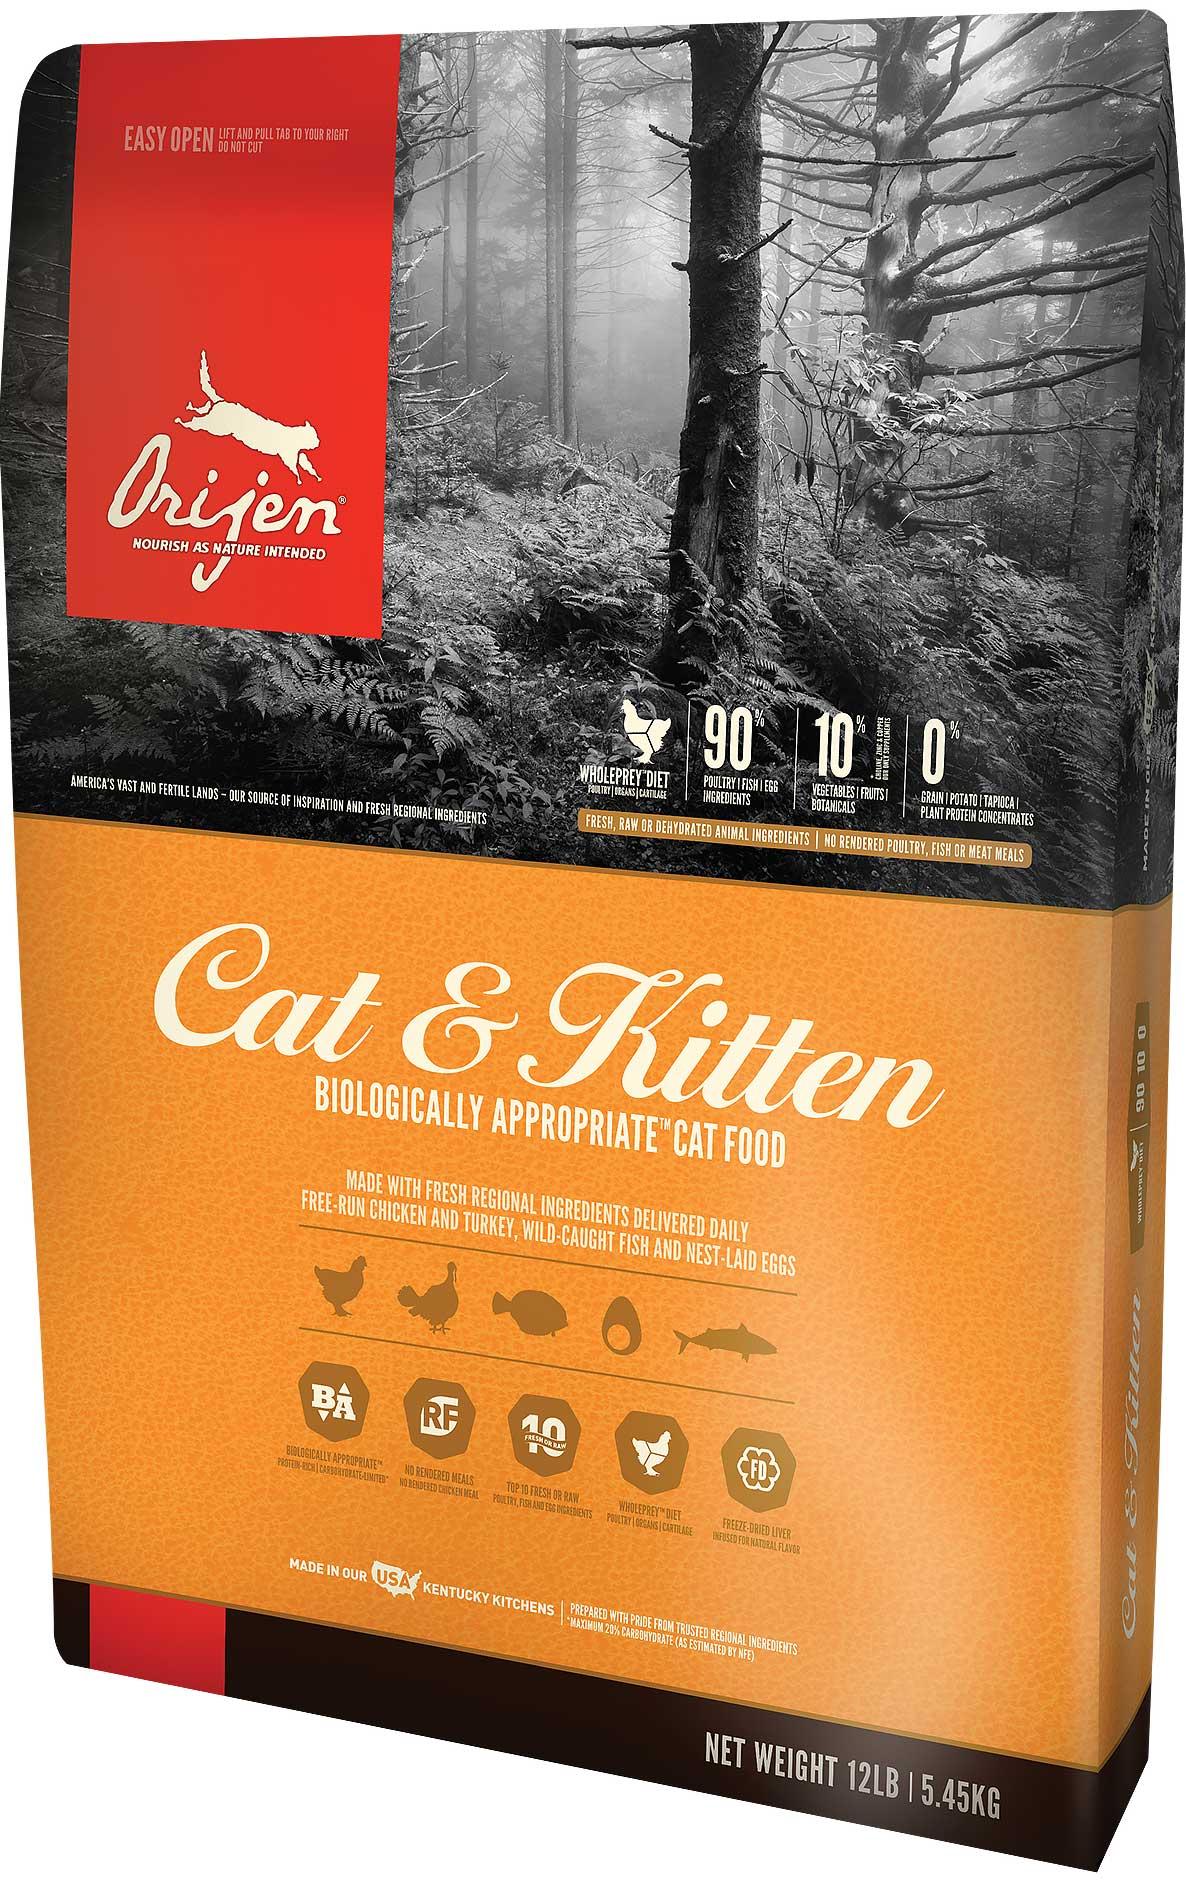 Orijen Cat & Kitten ออริเจน สูตรแมวและลูกแมว